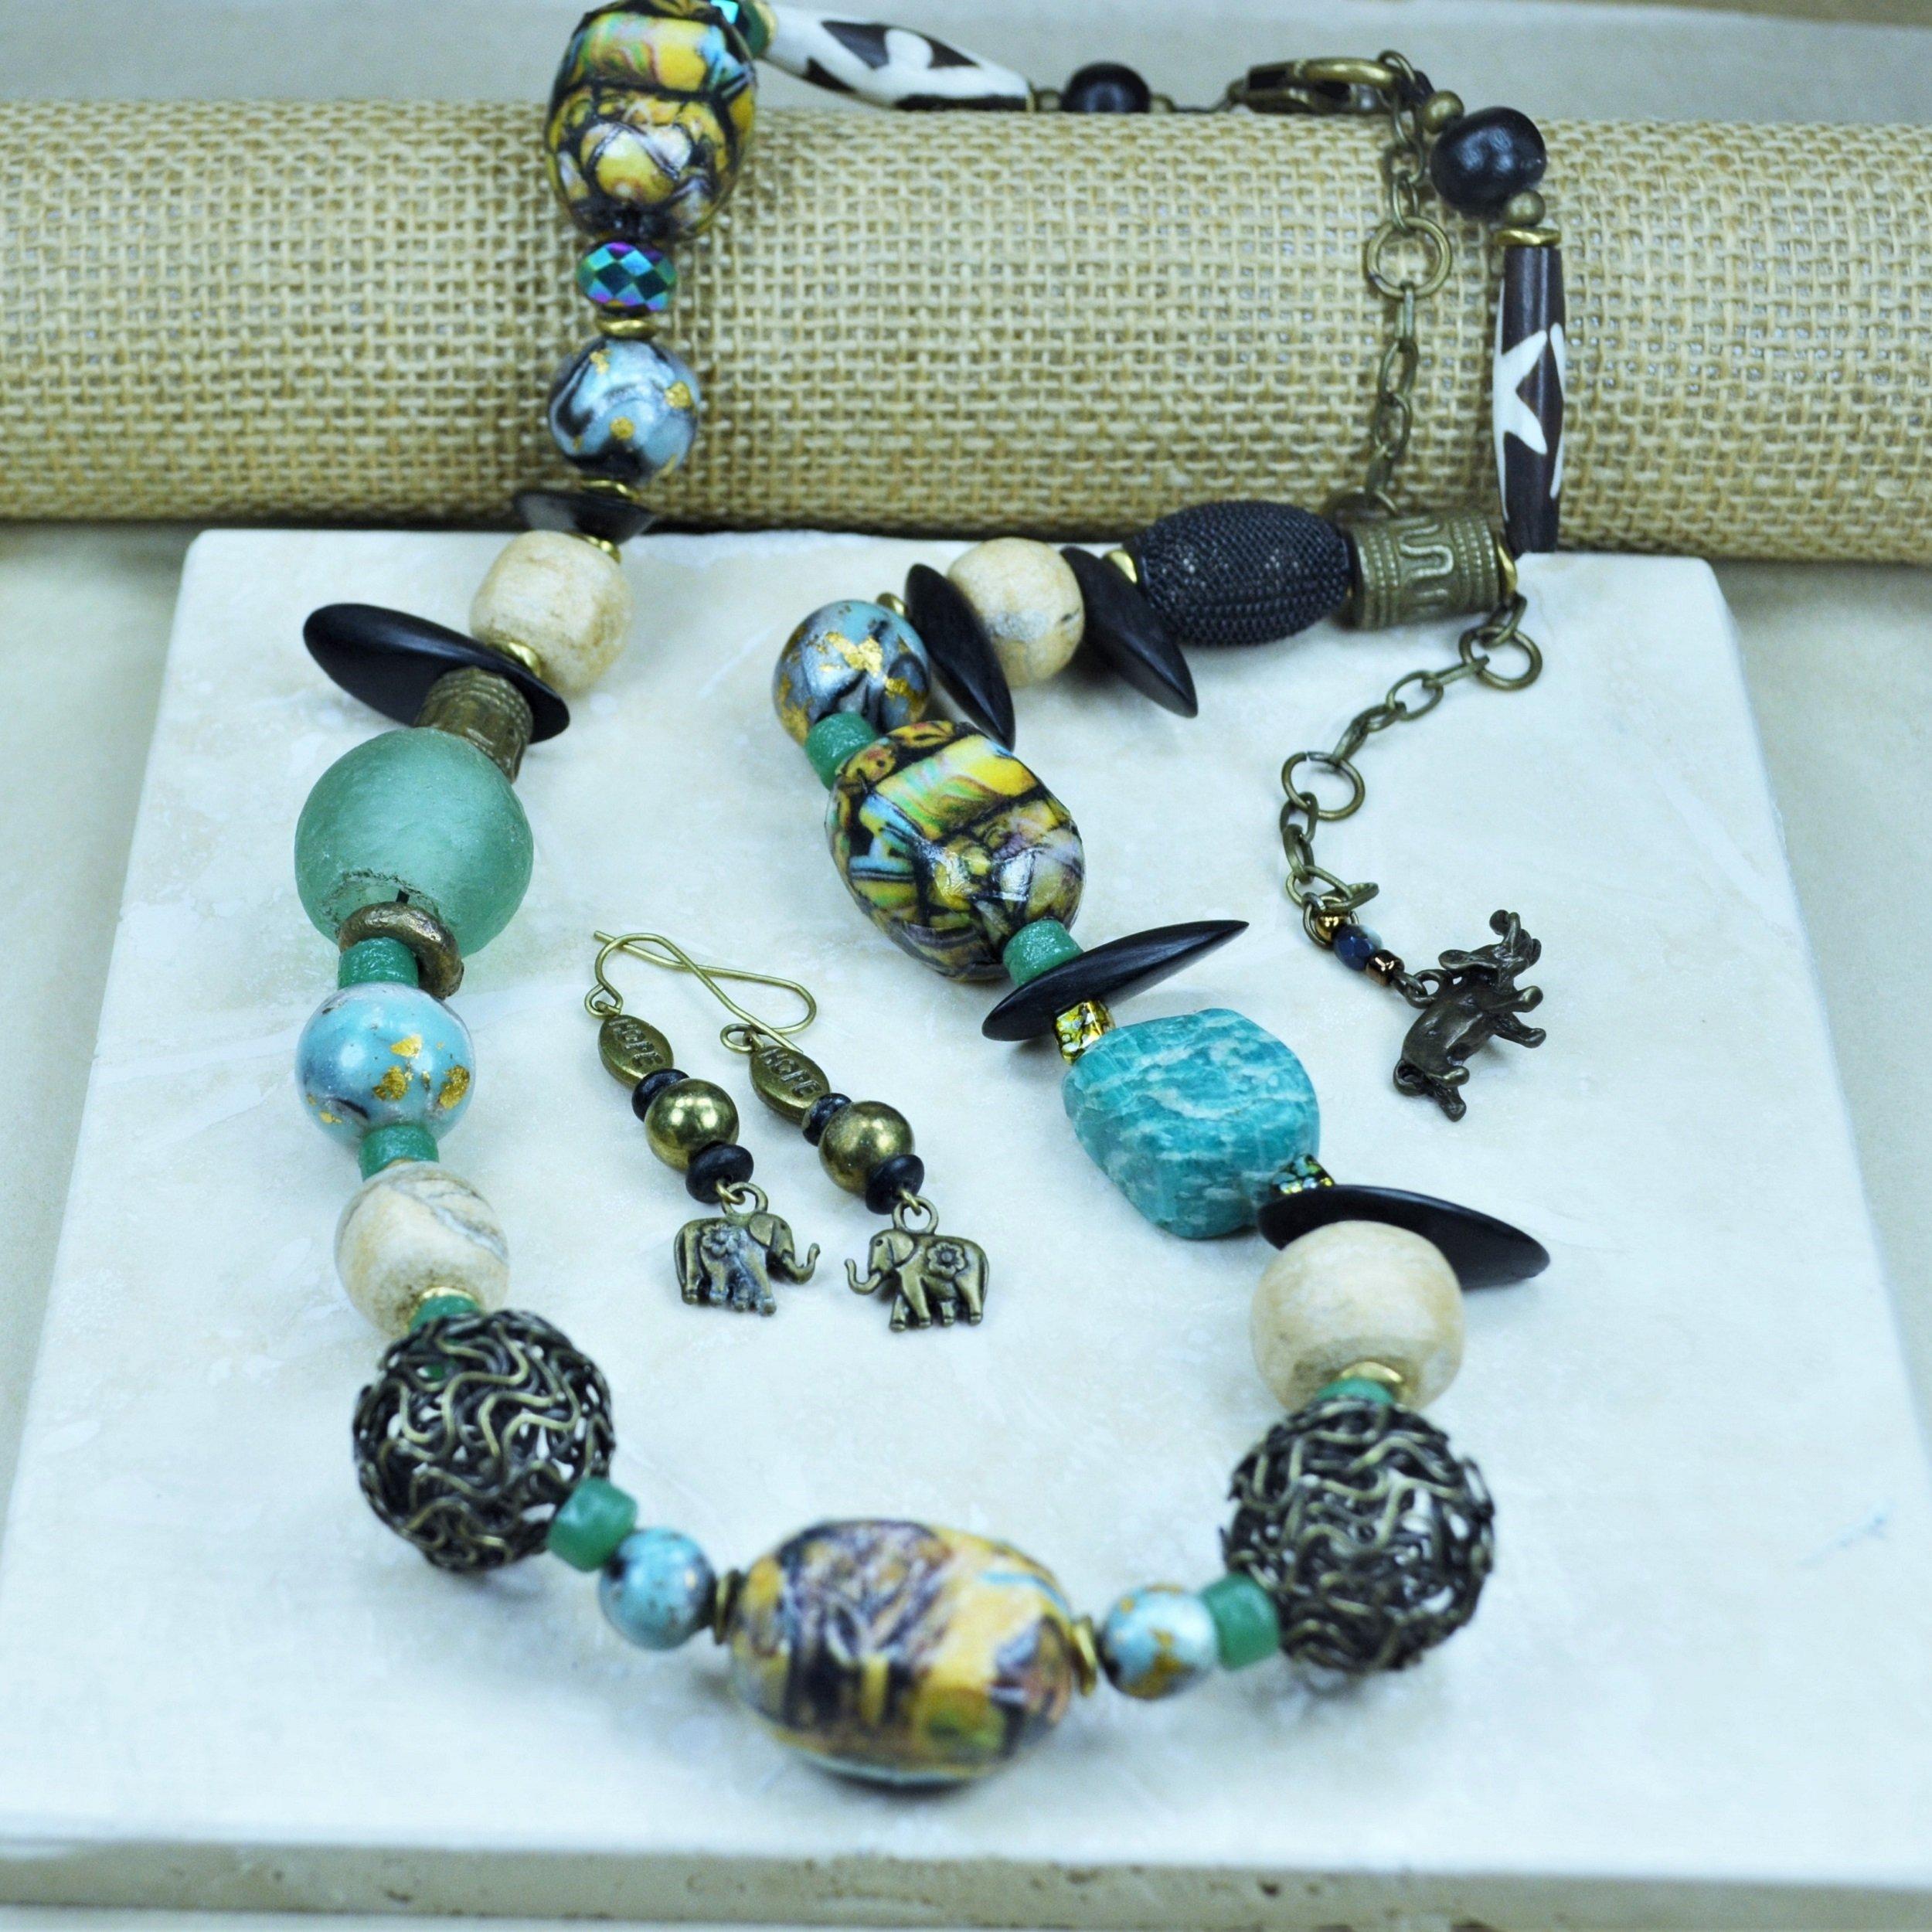 Malachite Woolly Mammoth Bone, Decoupage, Batik Toggle Necklace w/Earrings